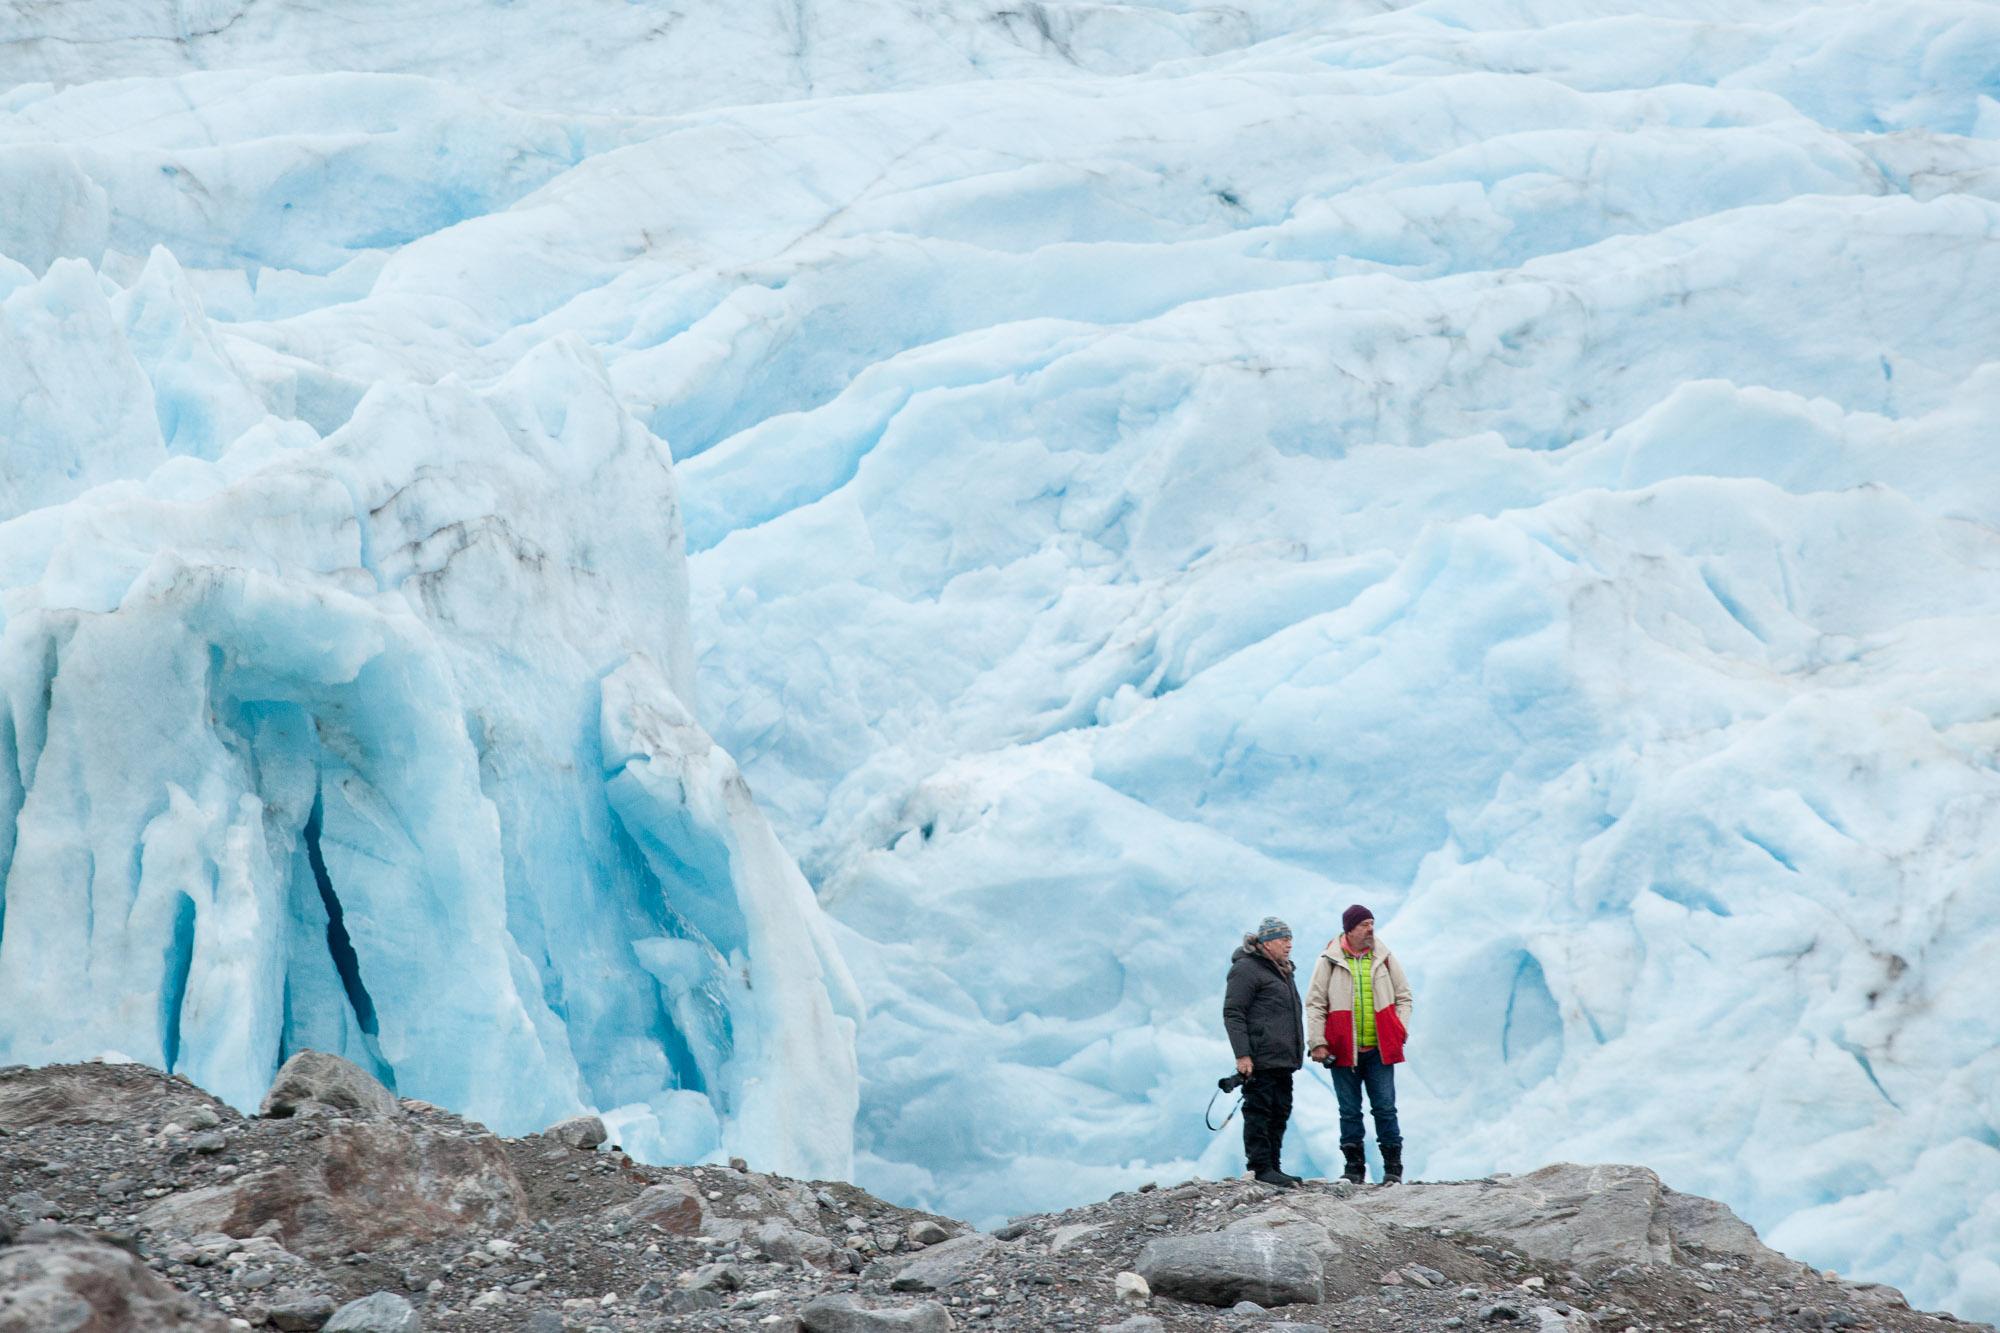 arctic-svalbard-4957.jpg